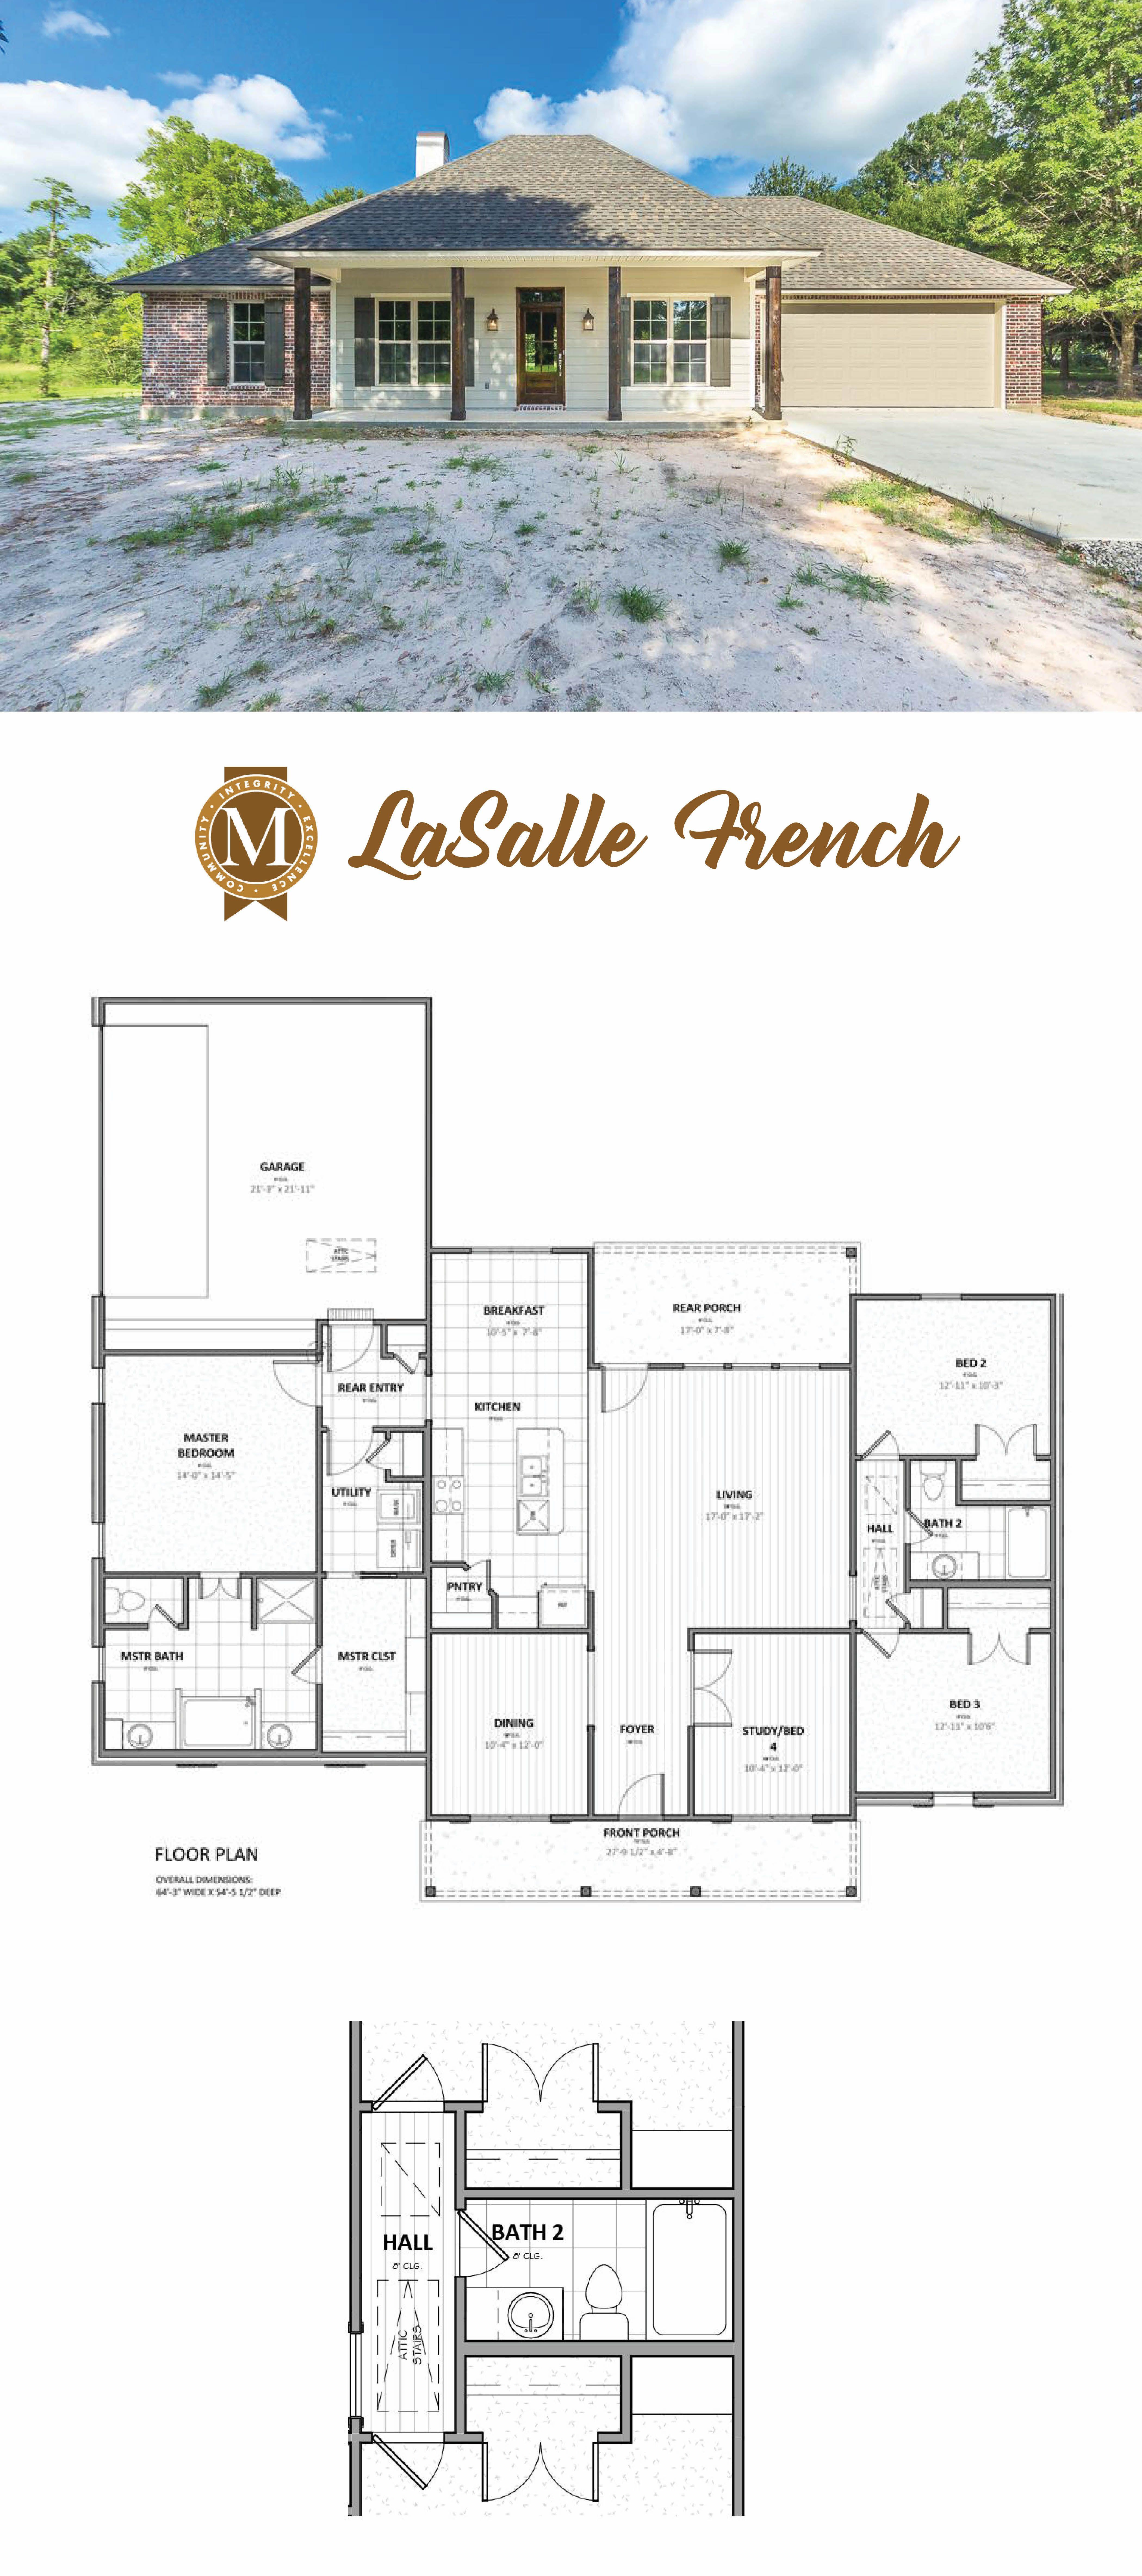 Lasalle French Floor Plan Living Sq Ft 2 031 Bedrooms 3 Baths 2 Lake Charles Lafayette Baton Rouge Louis House Plans Southern House Plans Modern House Plans